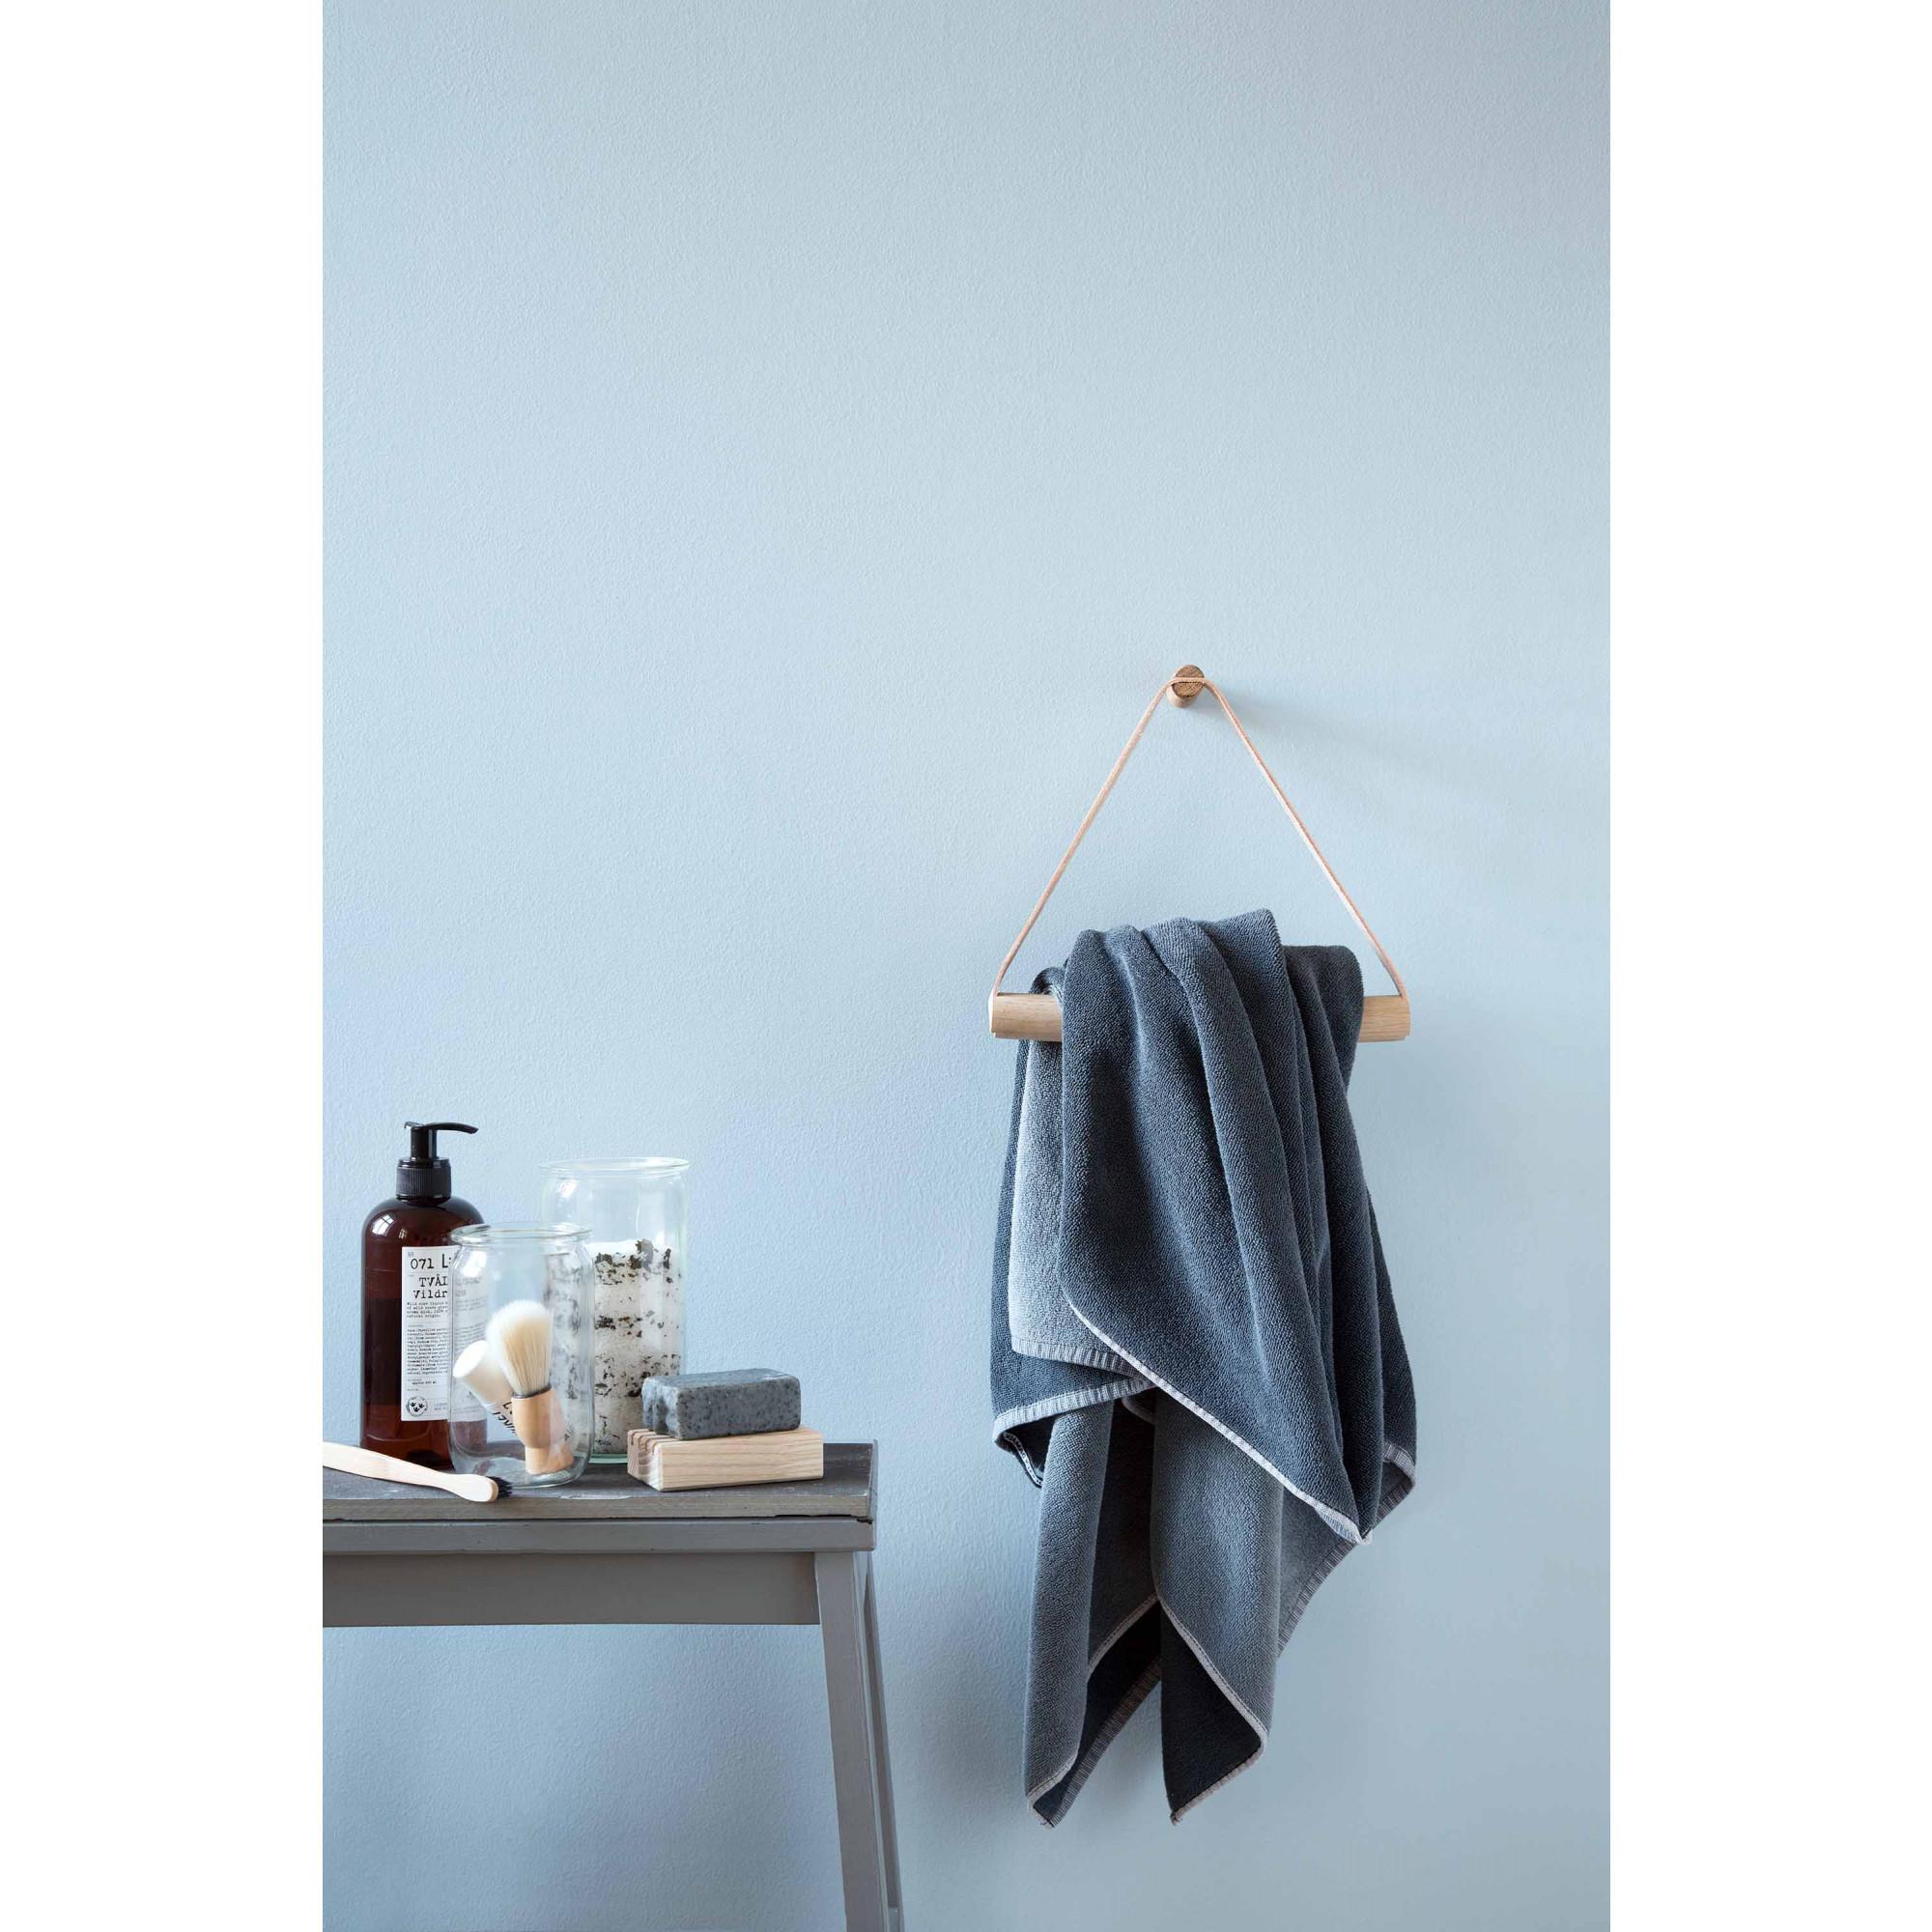 Porte-serviettes | Naturel